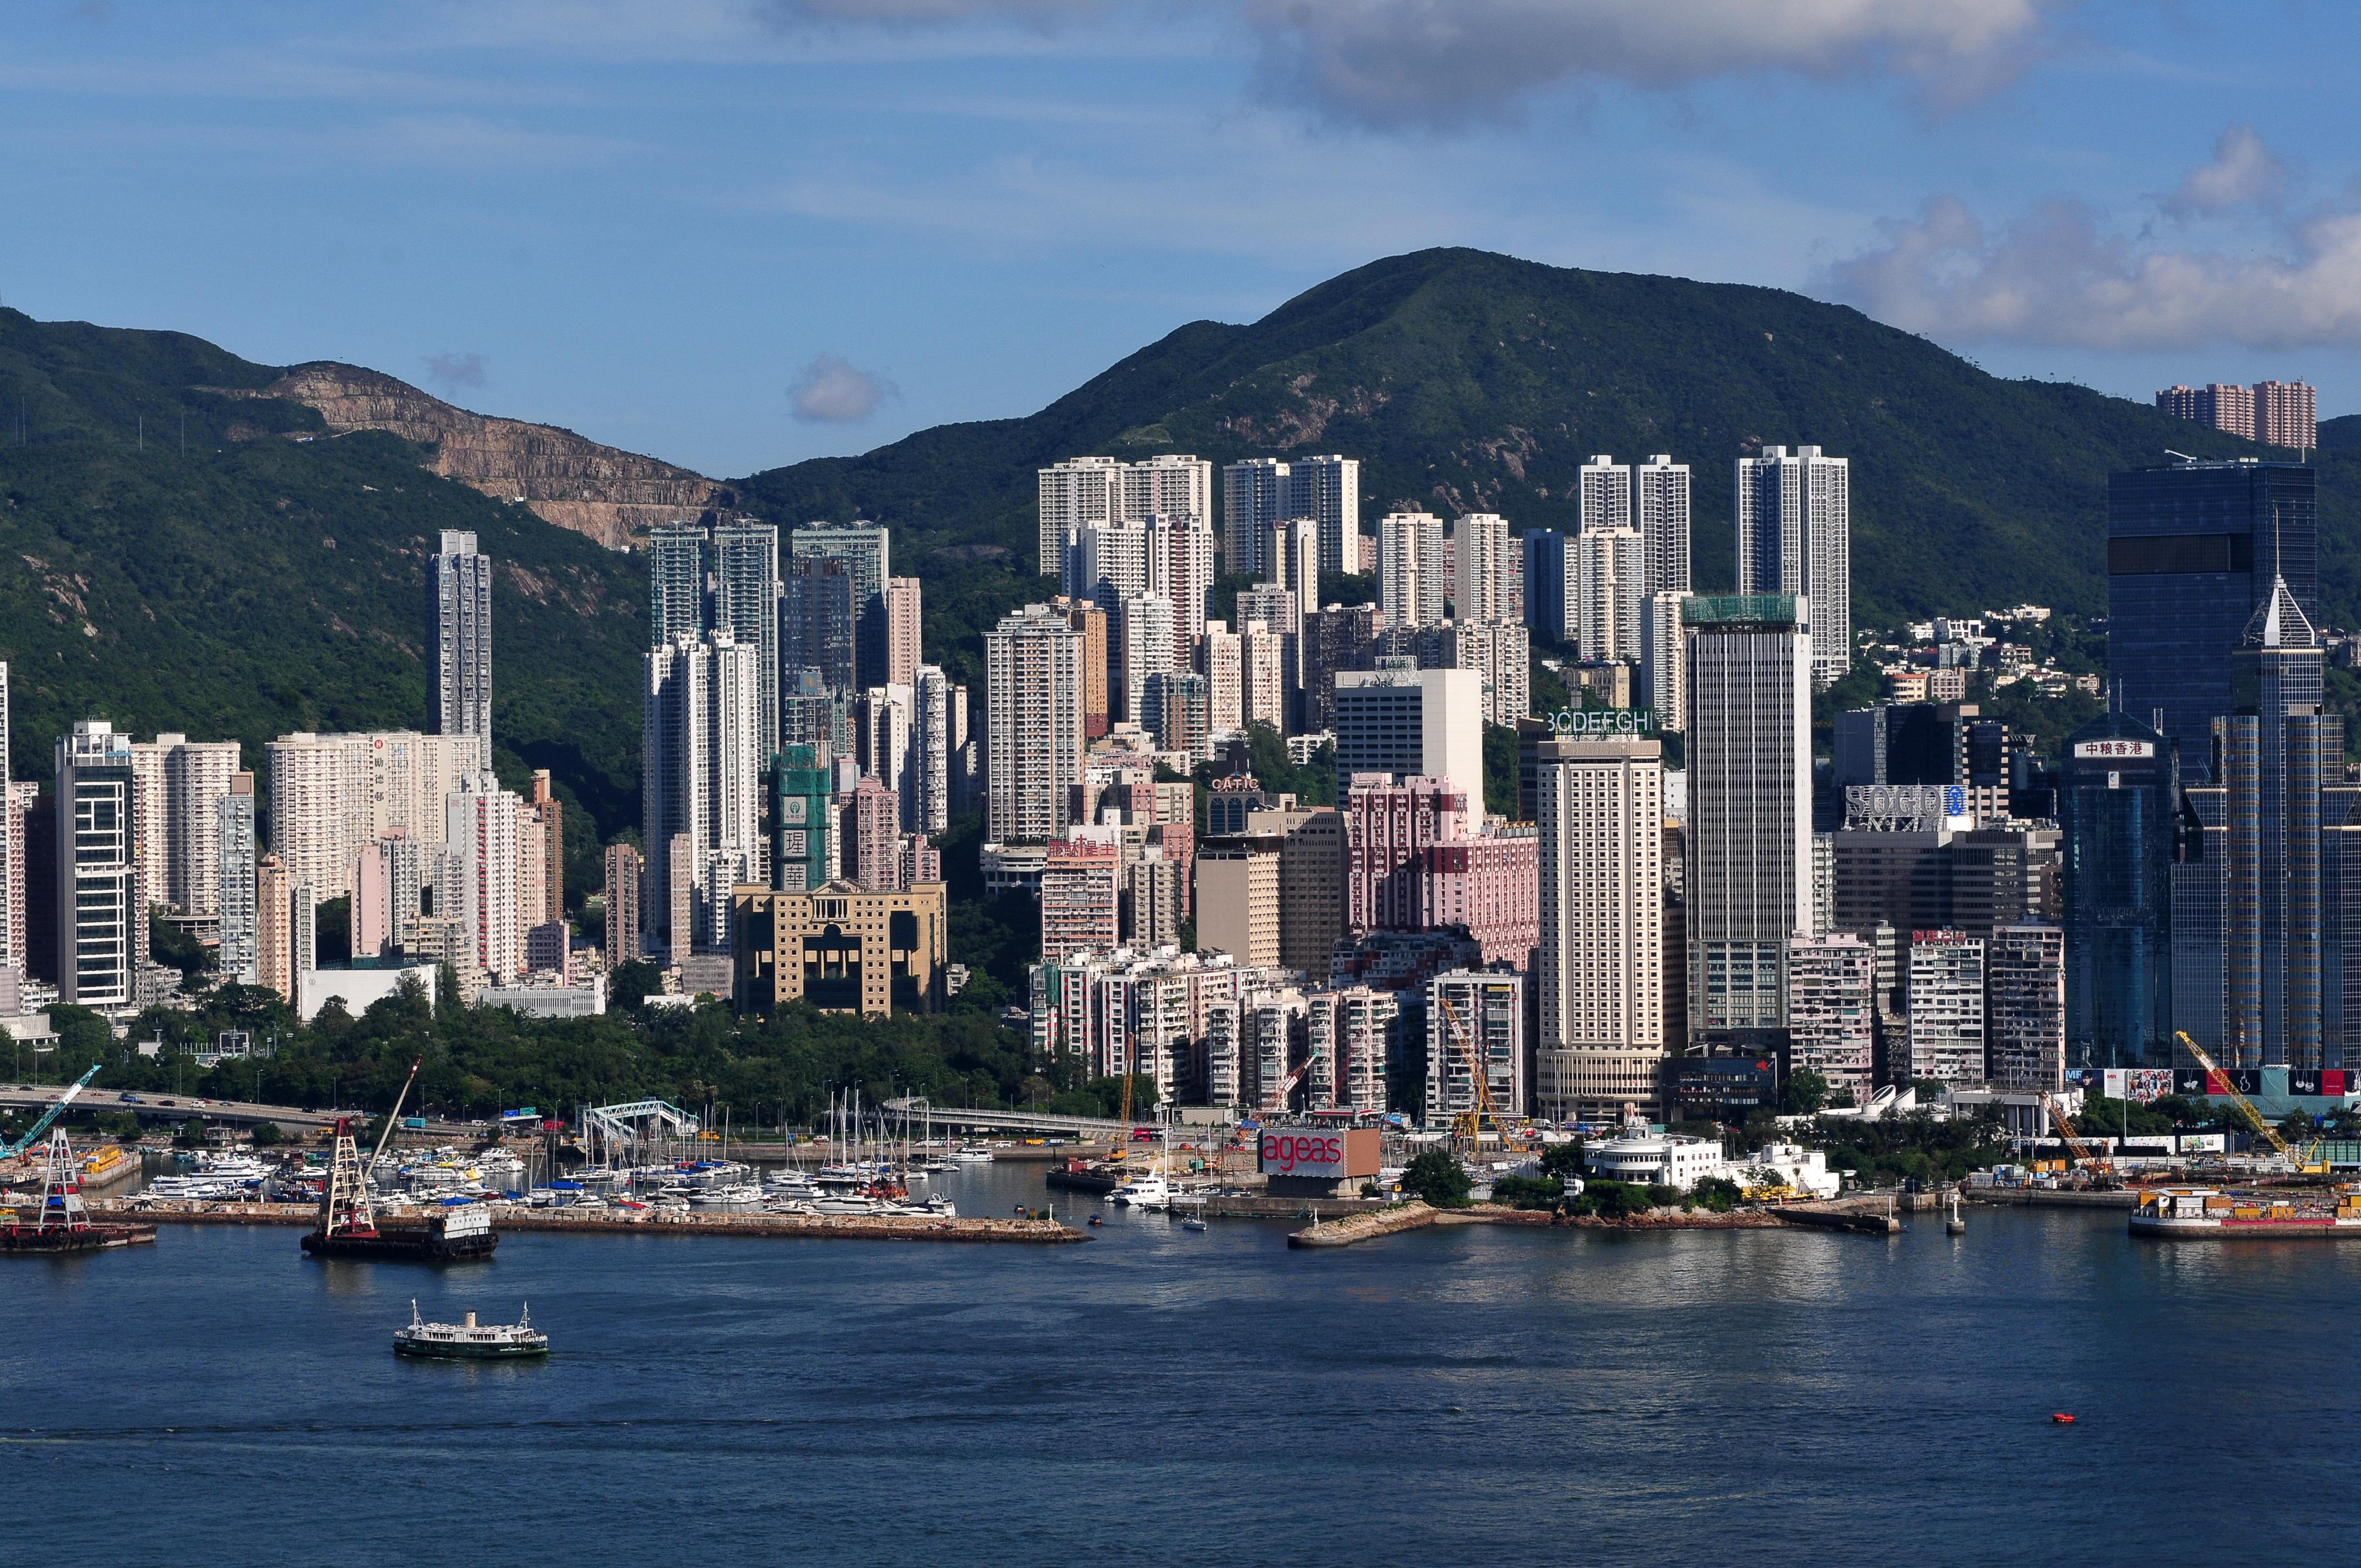 13-08-08-hongkong-by-RalfR-106.jpg